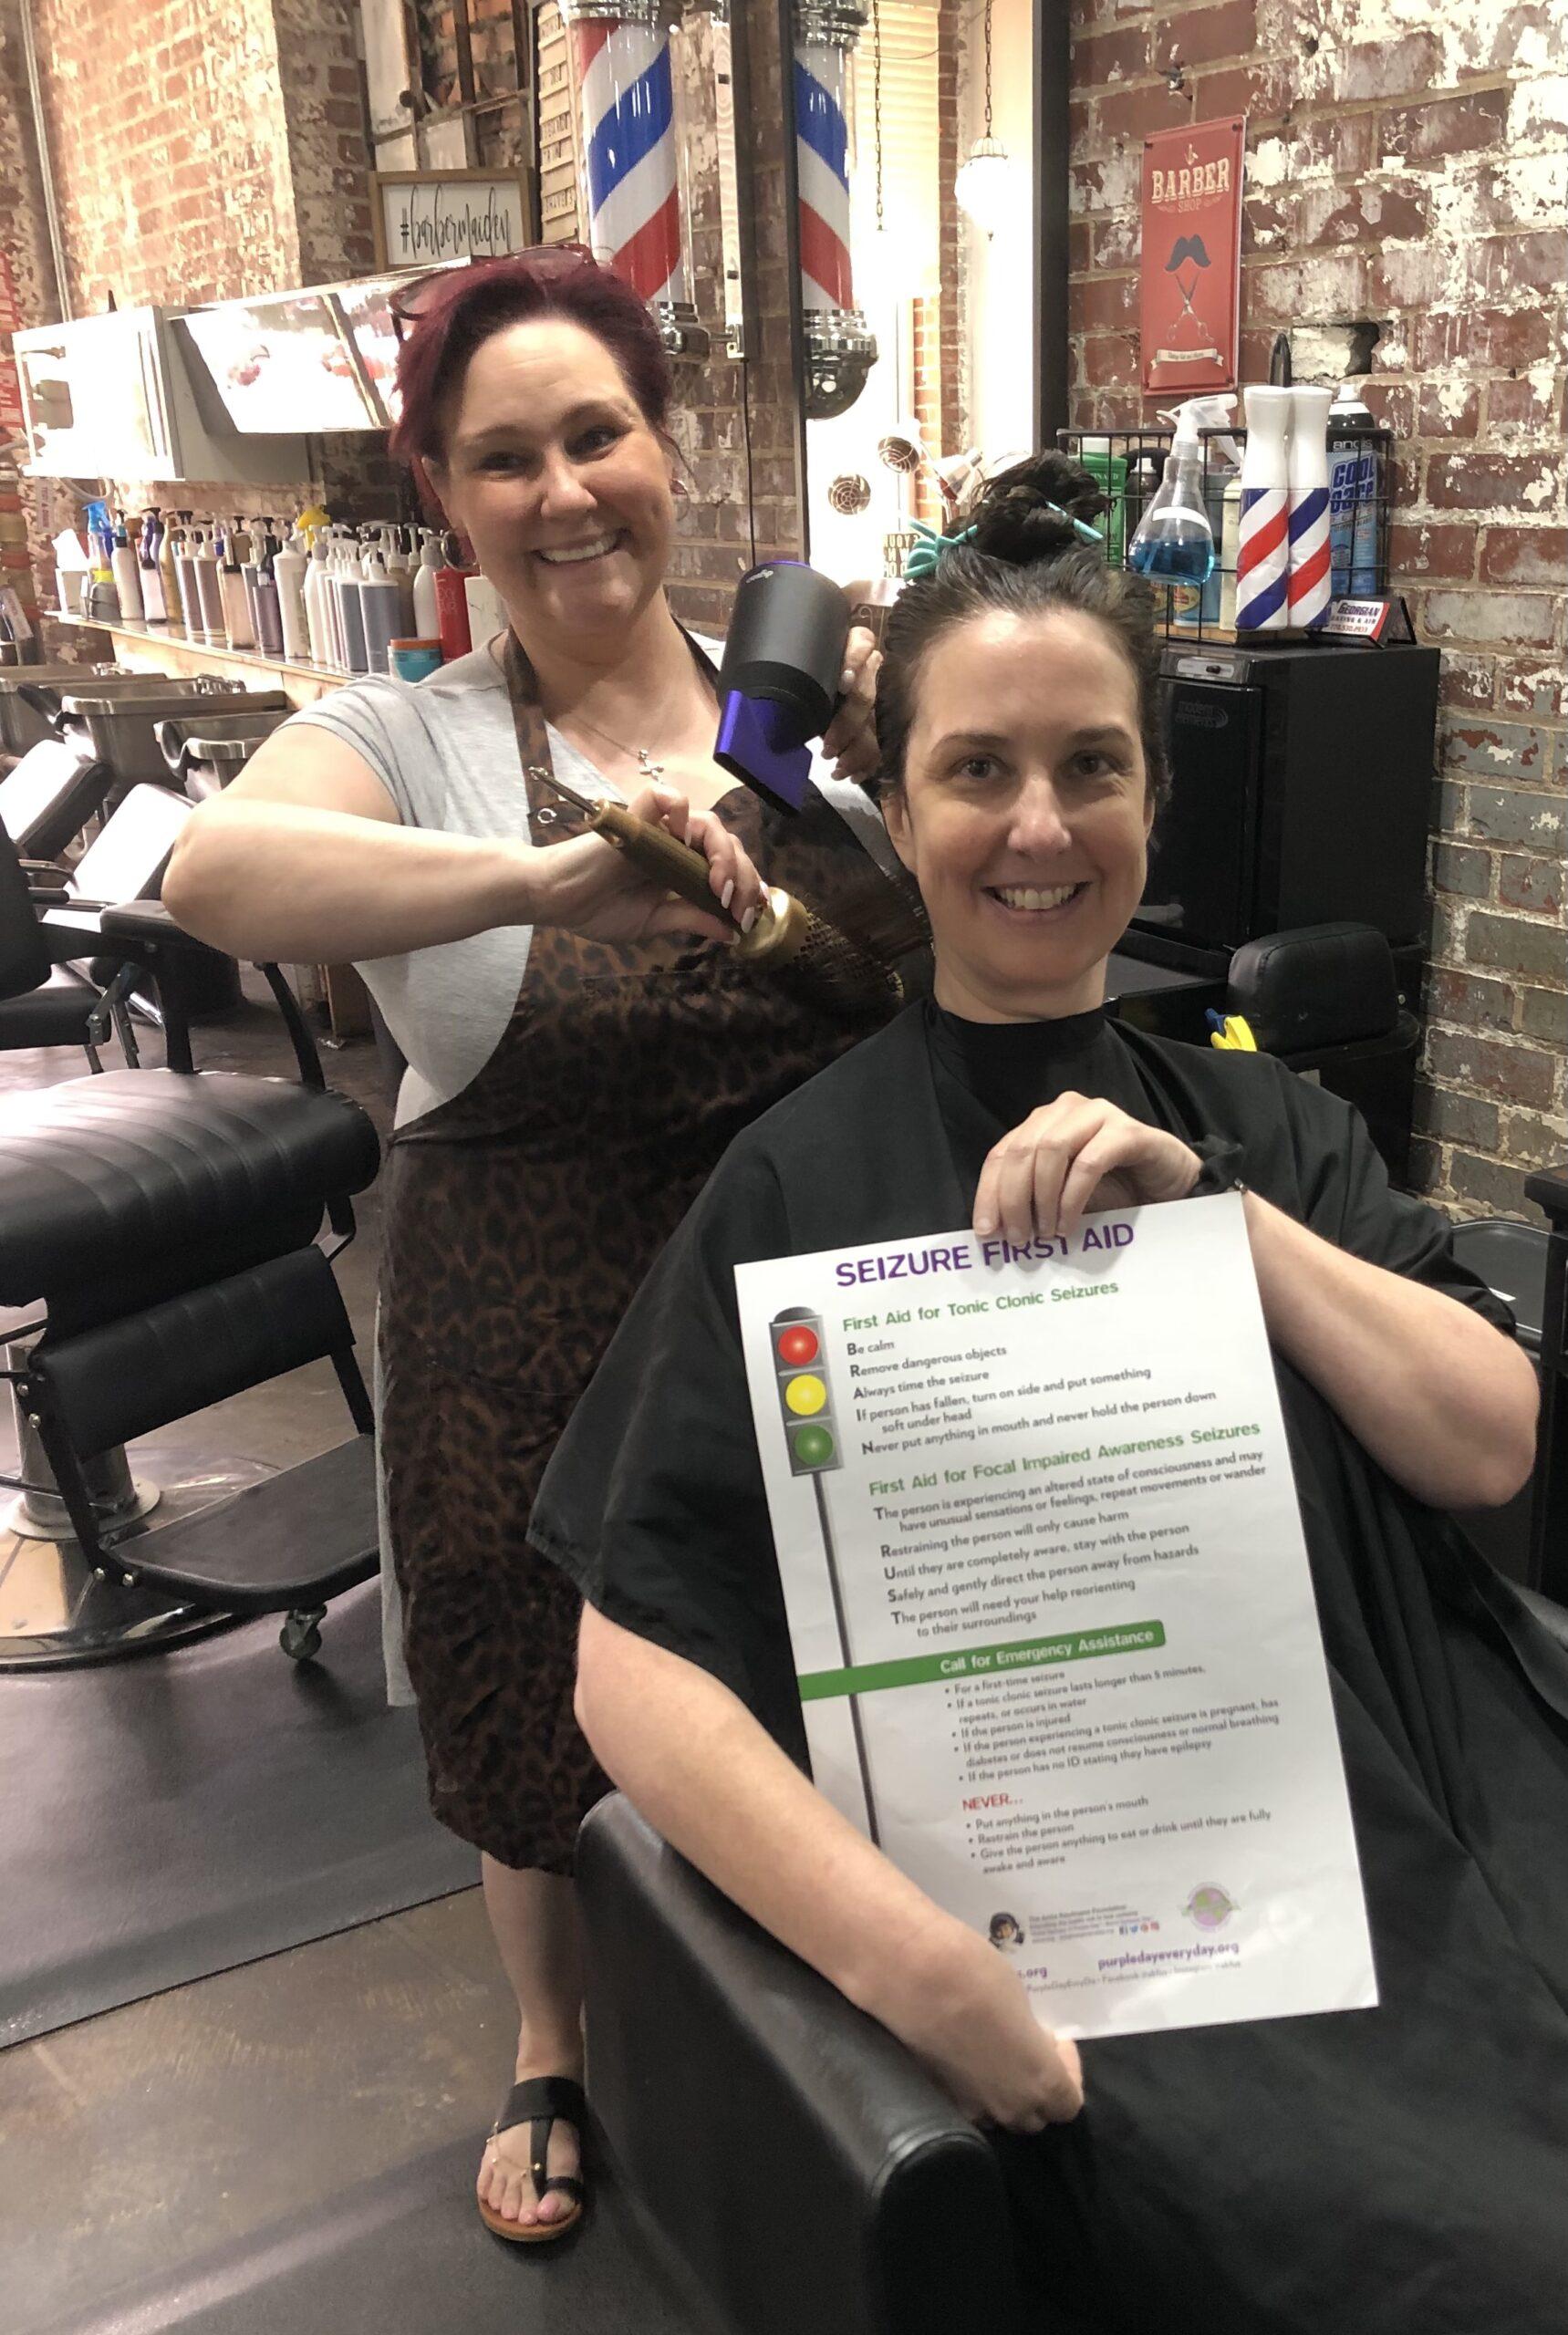 Woman sitting on chair in hair salon